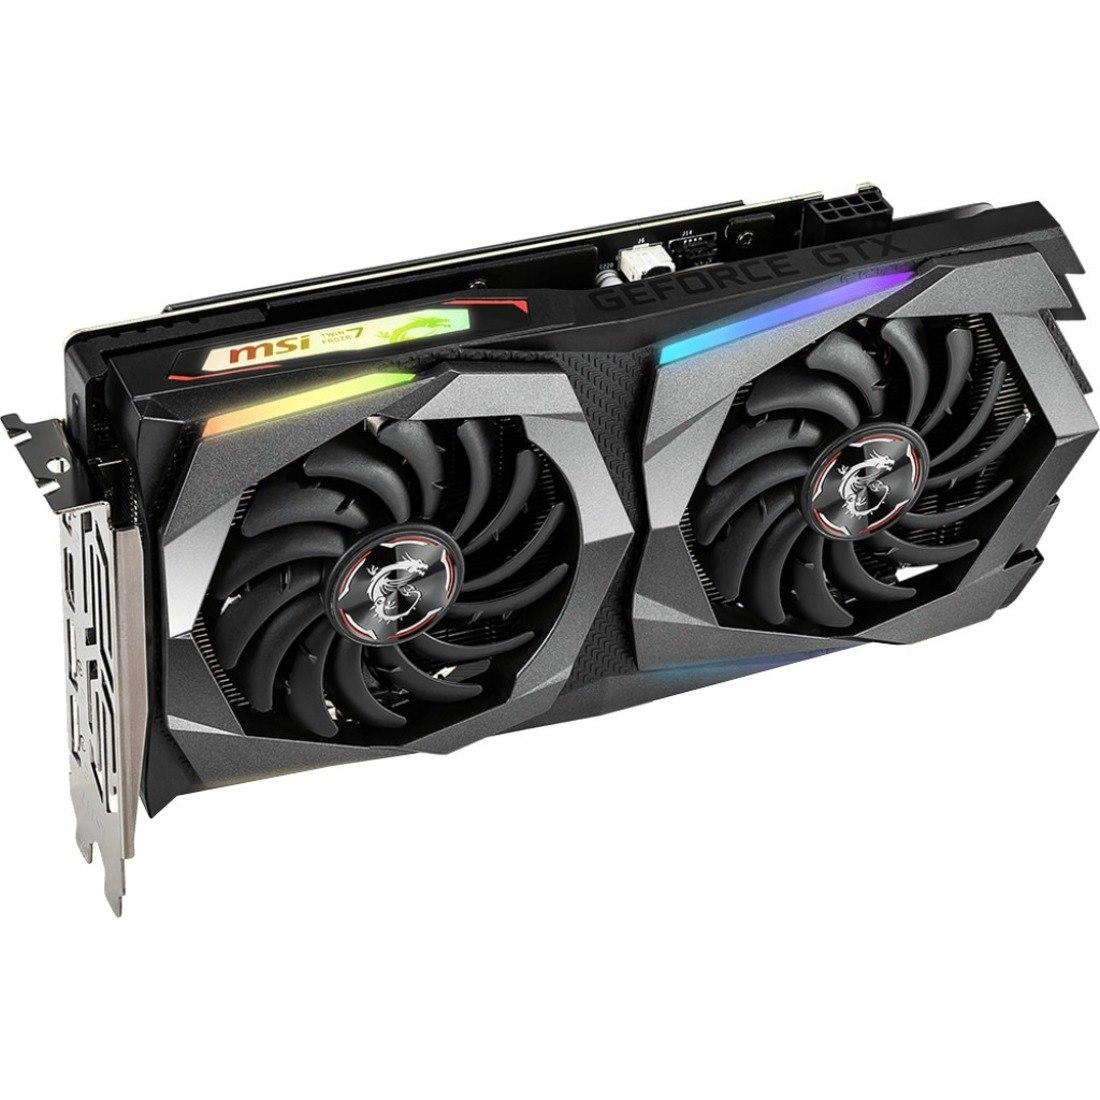 MSI GeForce GTX 1660 Ti GAMING X 6G GeForce GTX 1660 Ti Graphic Card - 6 GB GDDR6